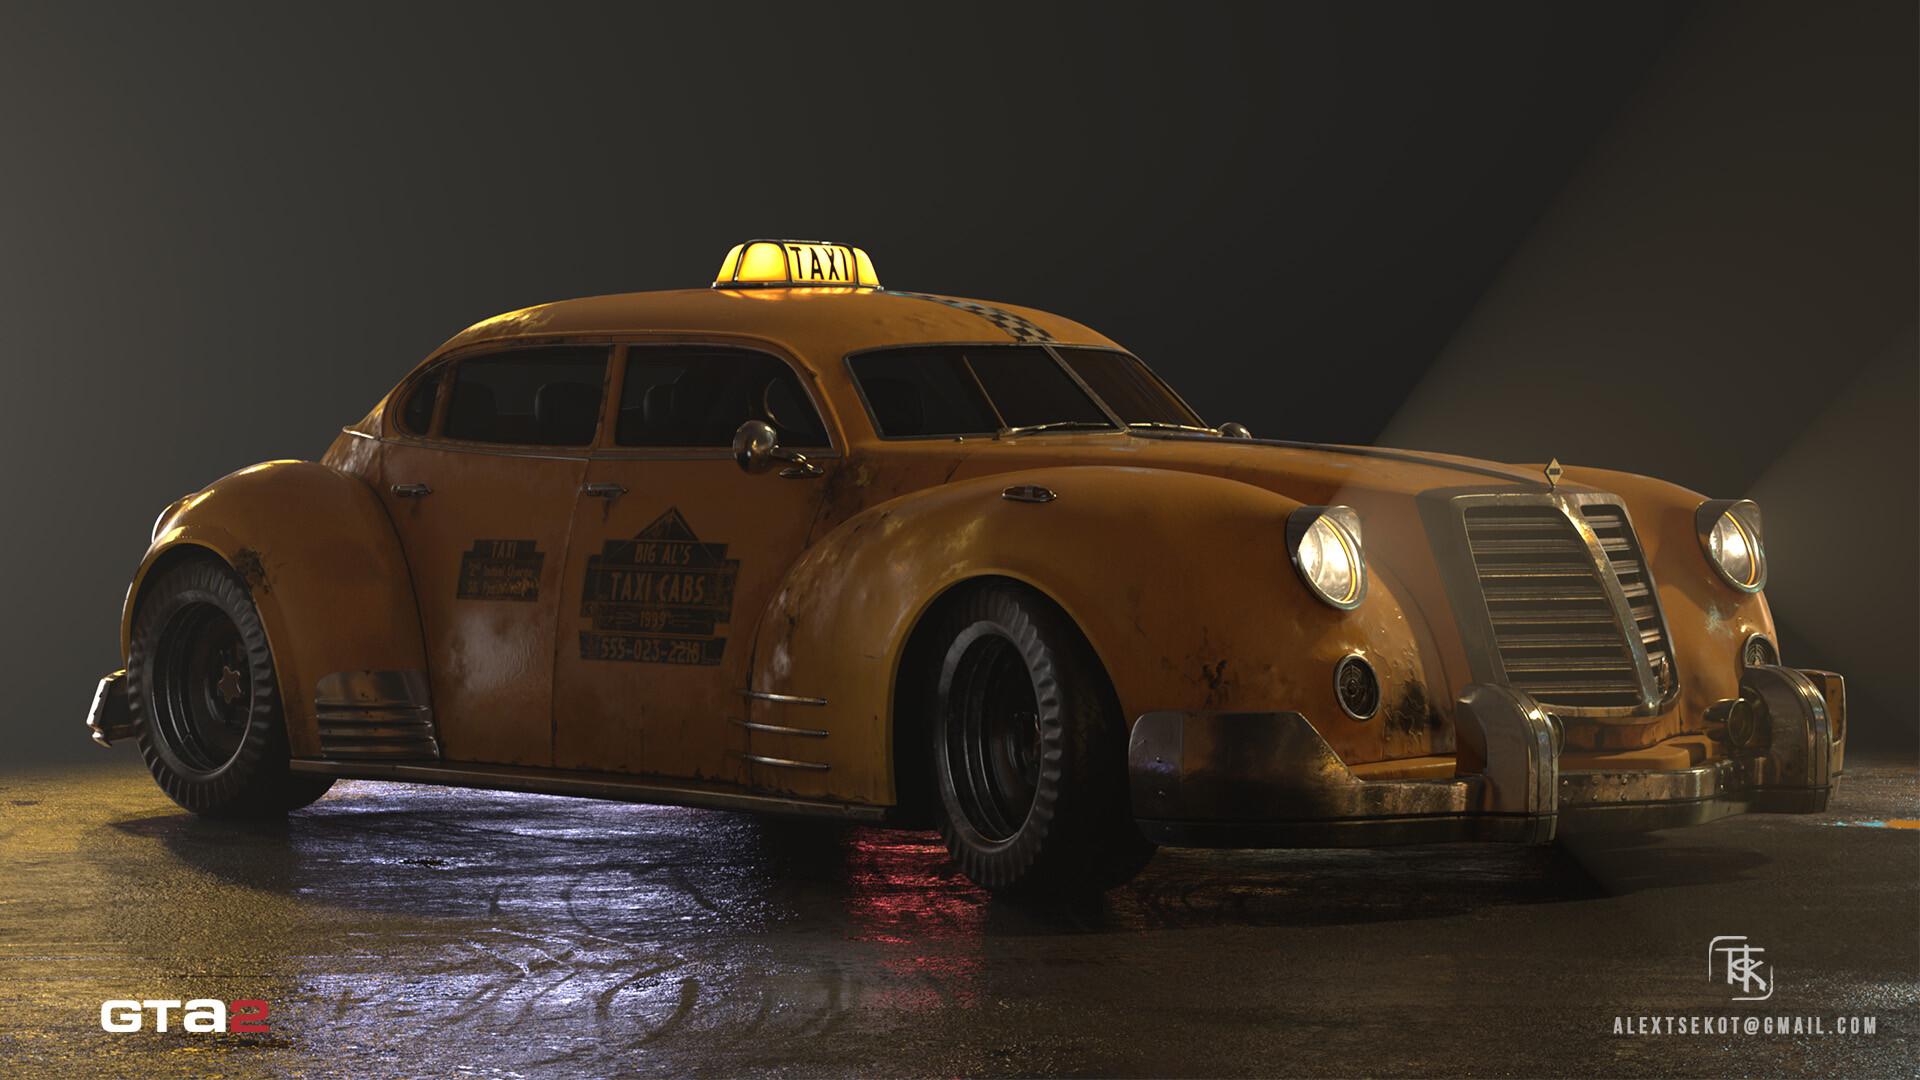 alex-tsekot-taxi-xpress-8.jpg?1548334134